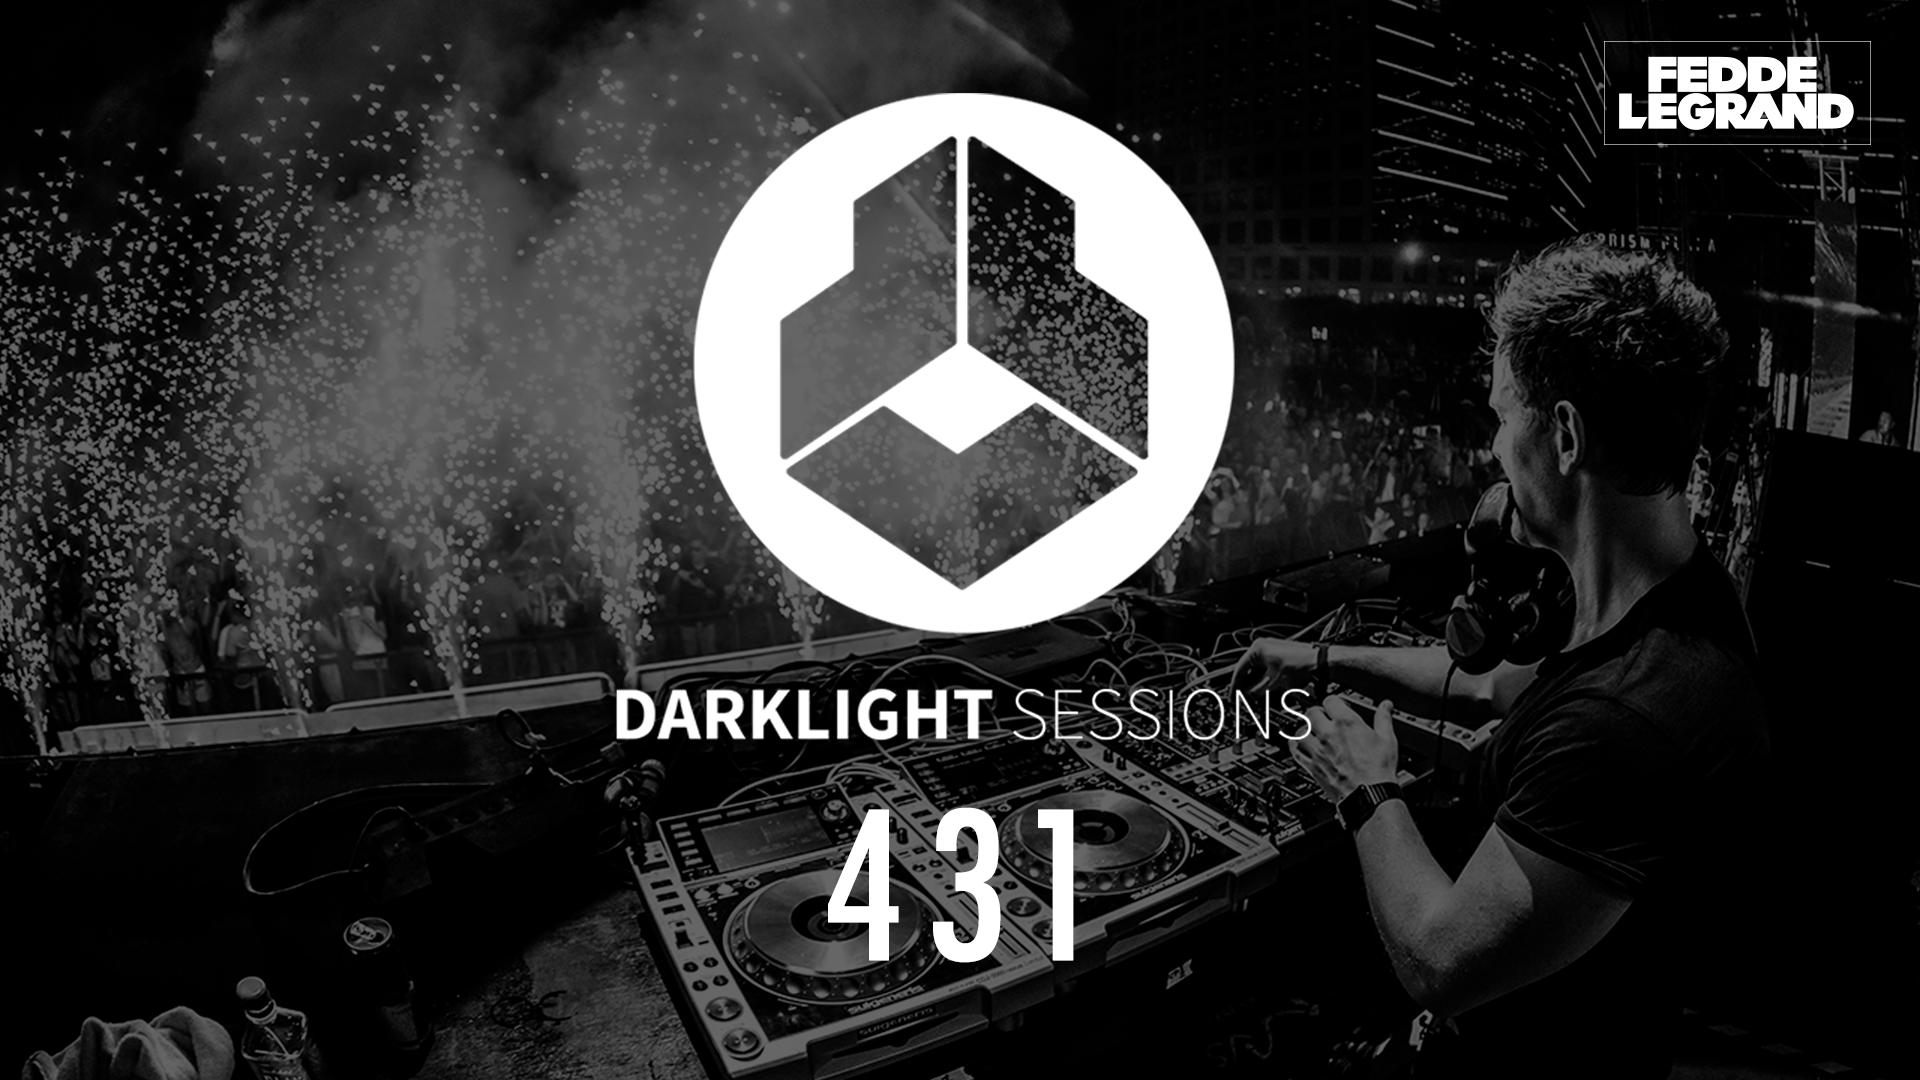 Darklight Sessions 431